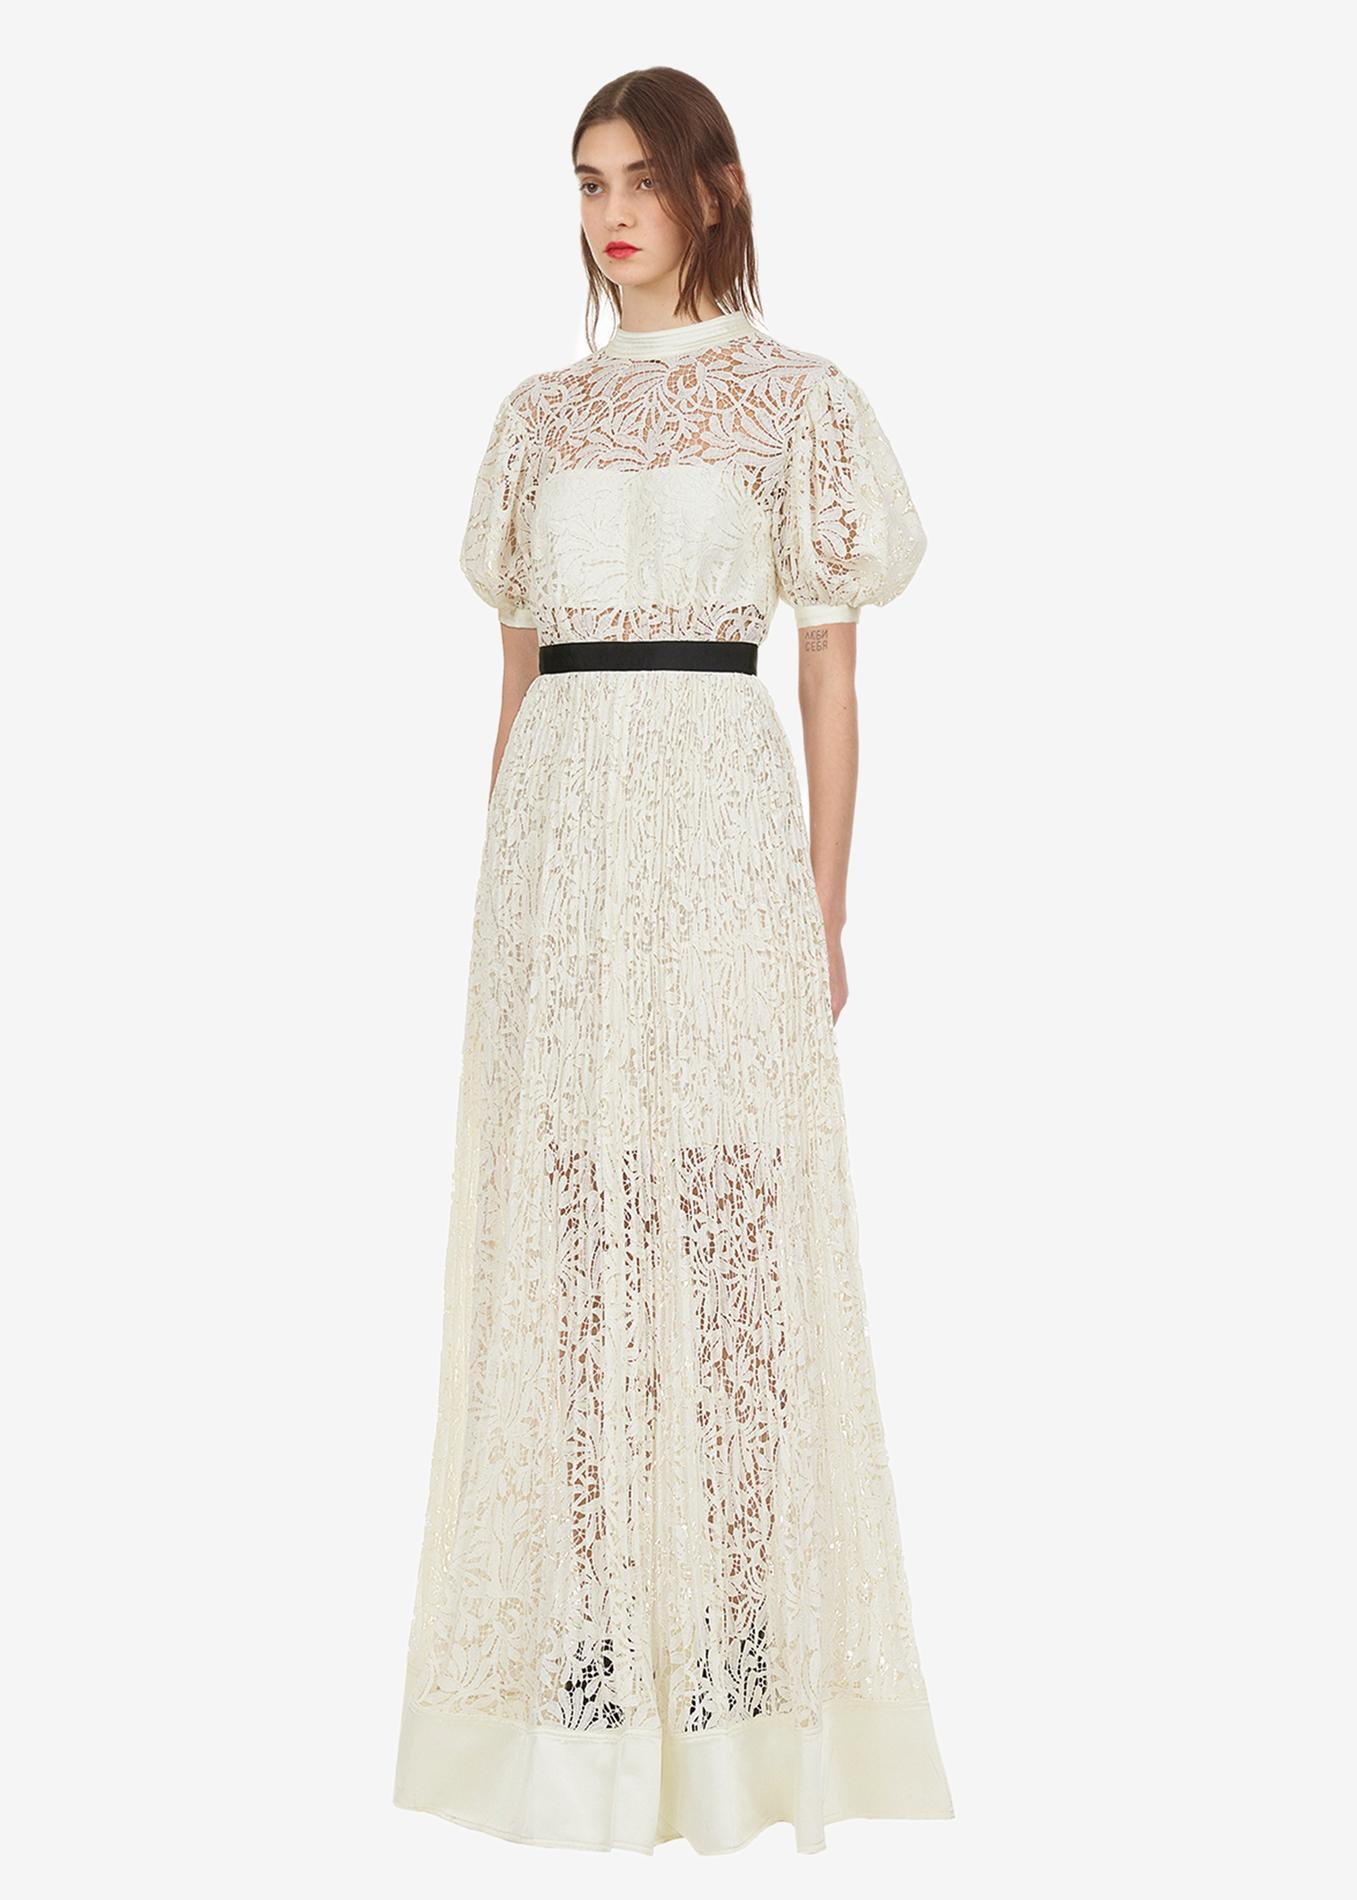 Peut On Acheter Sa Robe De Mariee En Soldes Madame Figaro